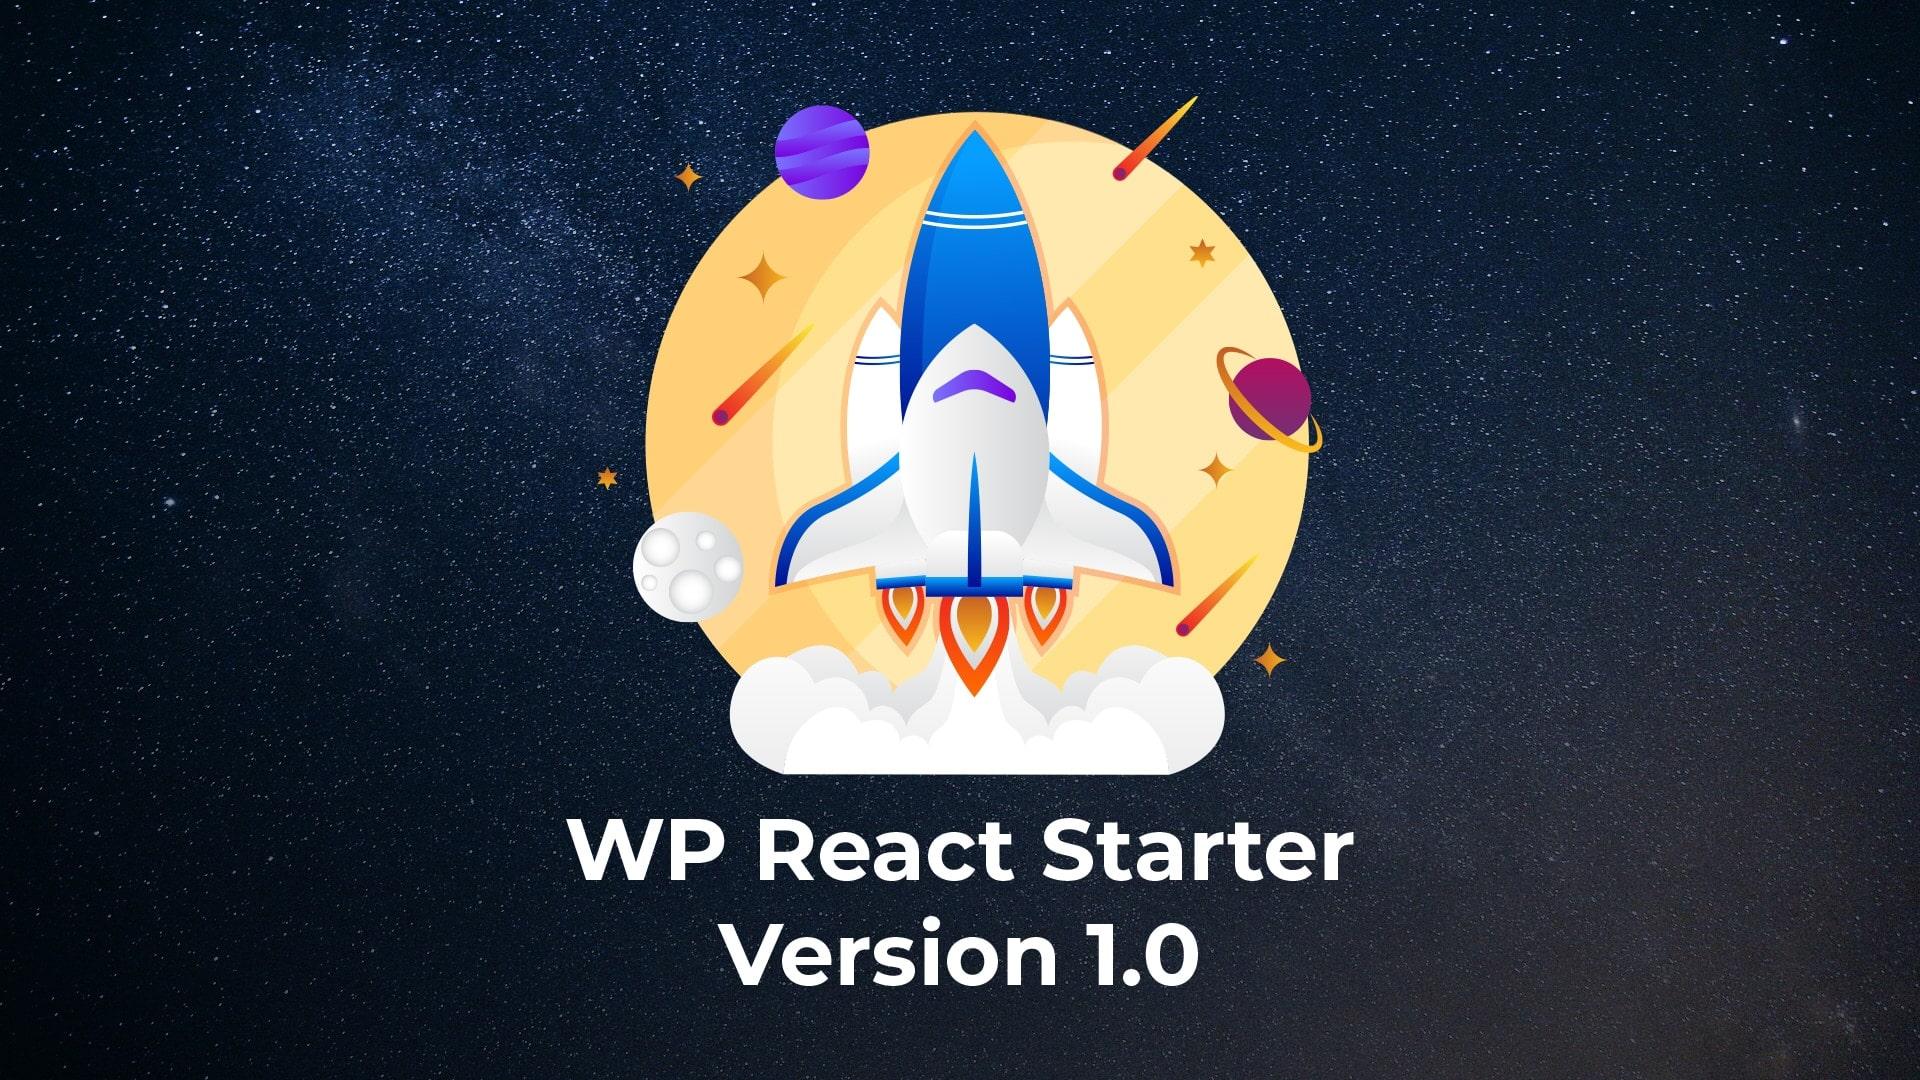 WP React Starter 1.0